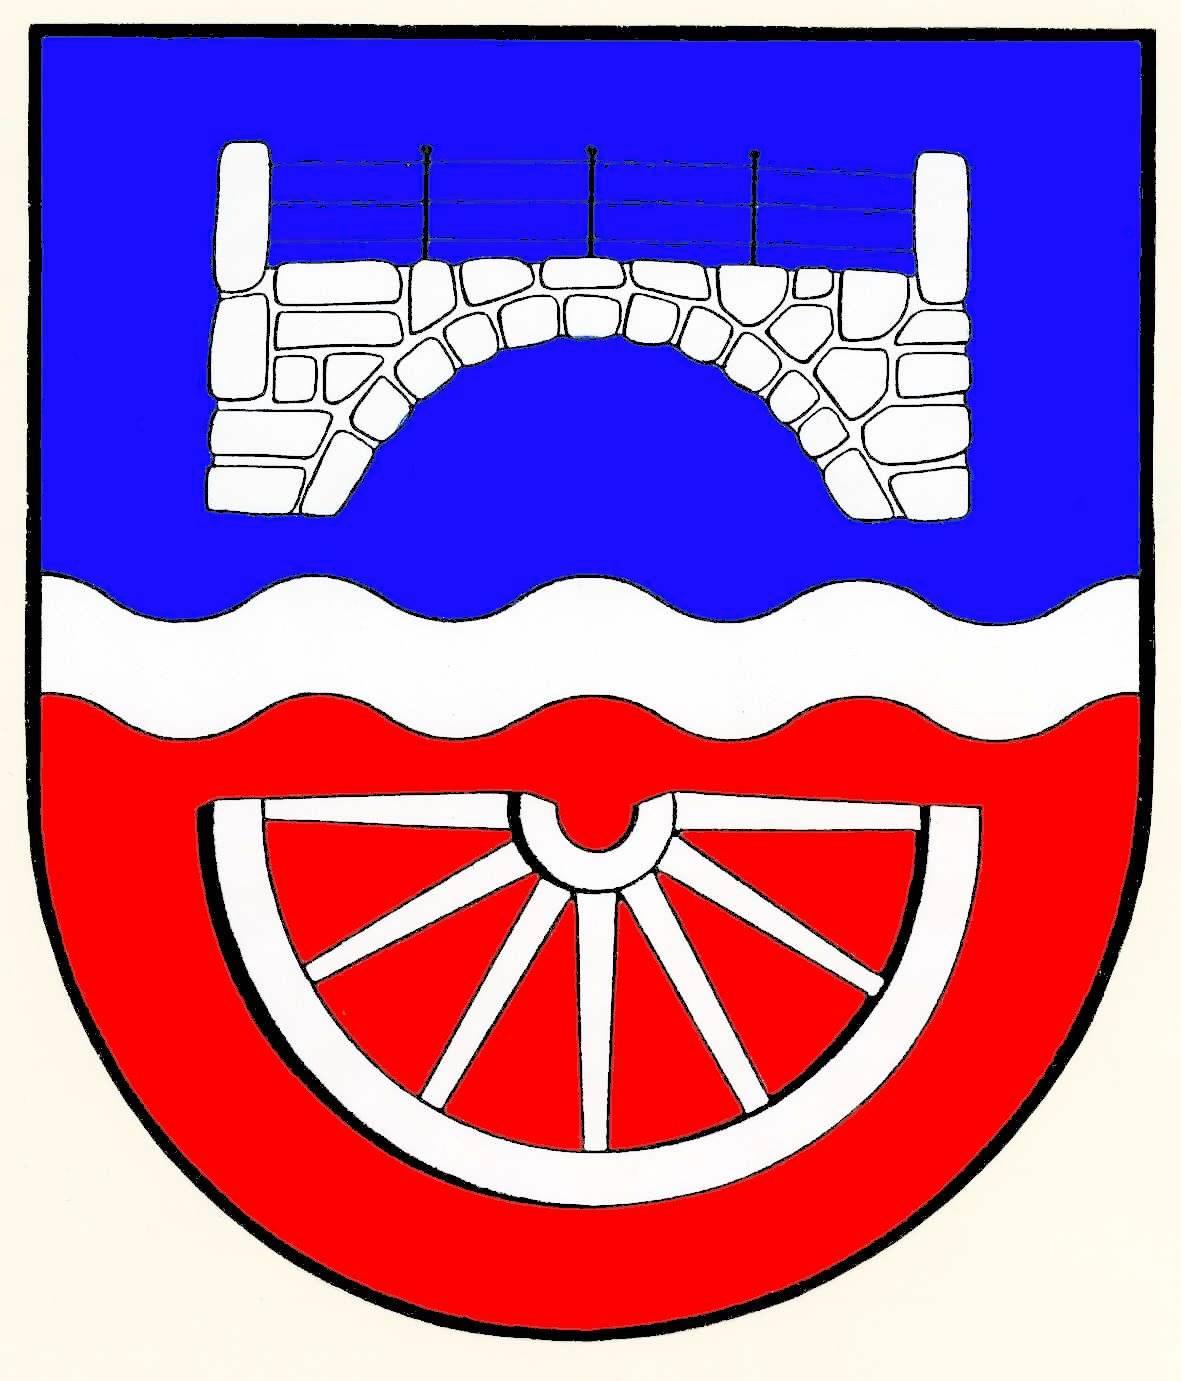 Wappen GemeindeBrügge, Kreis Rendsburg-Eckernförde